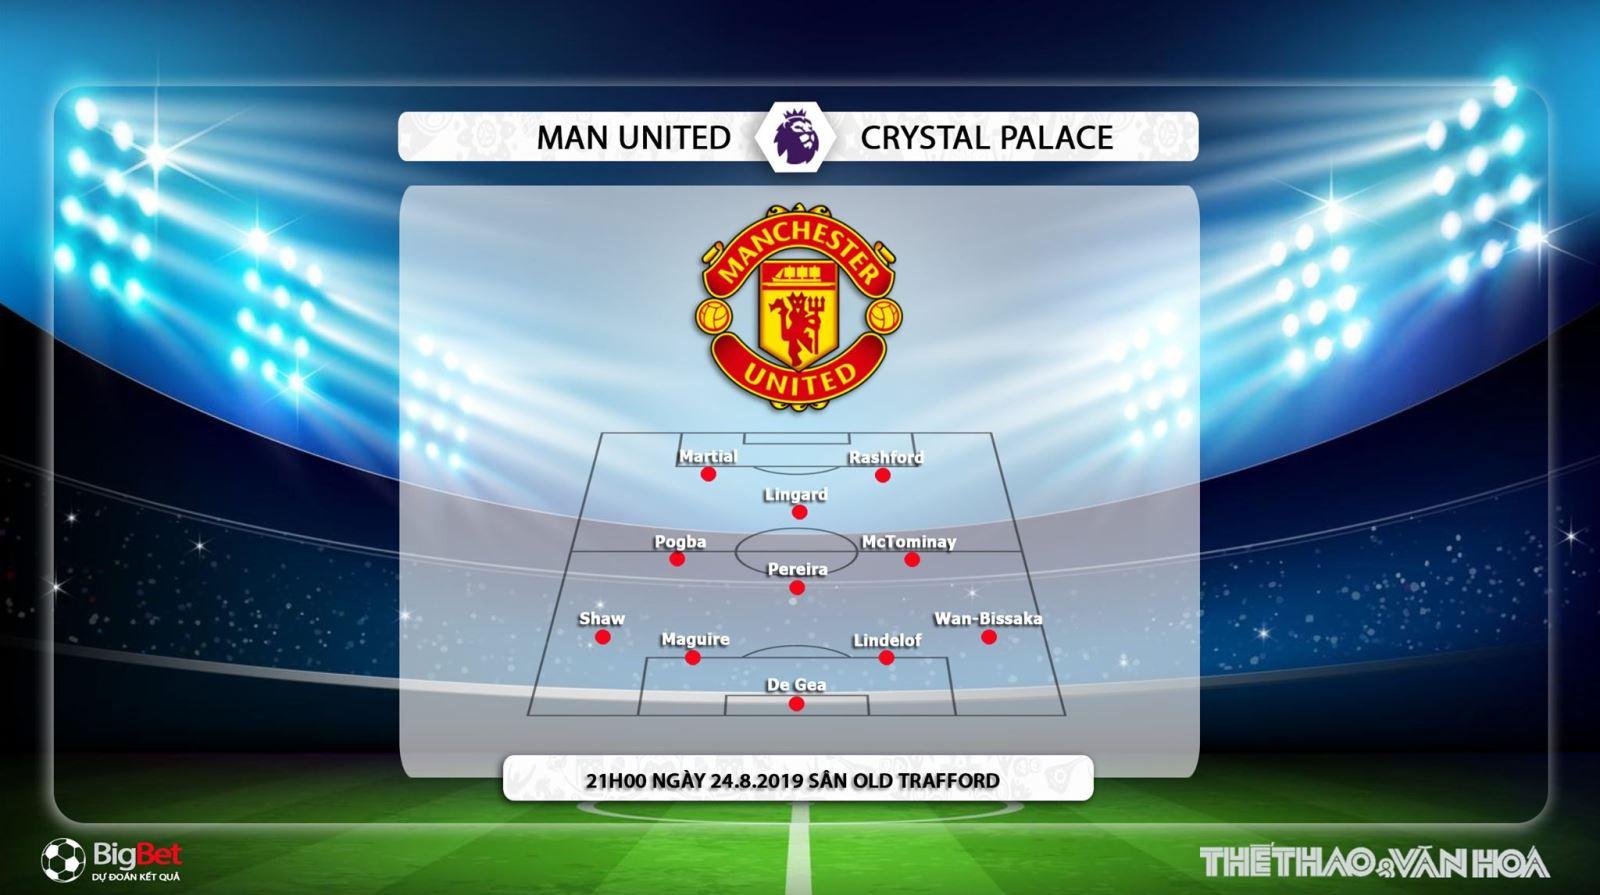 MU vs Crystal Palace, MU, Crystal Palace, soi kèo MU vs Crystal Palace, trực tiếp bóng đá MU vs Crystal Palace, nhận định MU vs Crystal Palace, dự đoán MU vs Crystal Palace